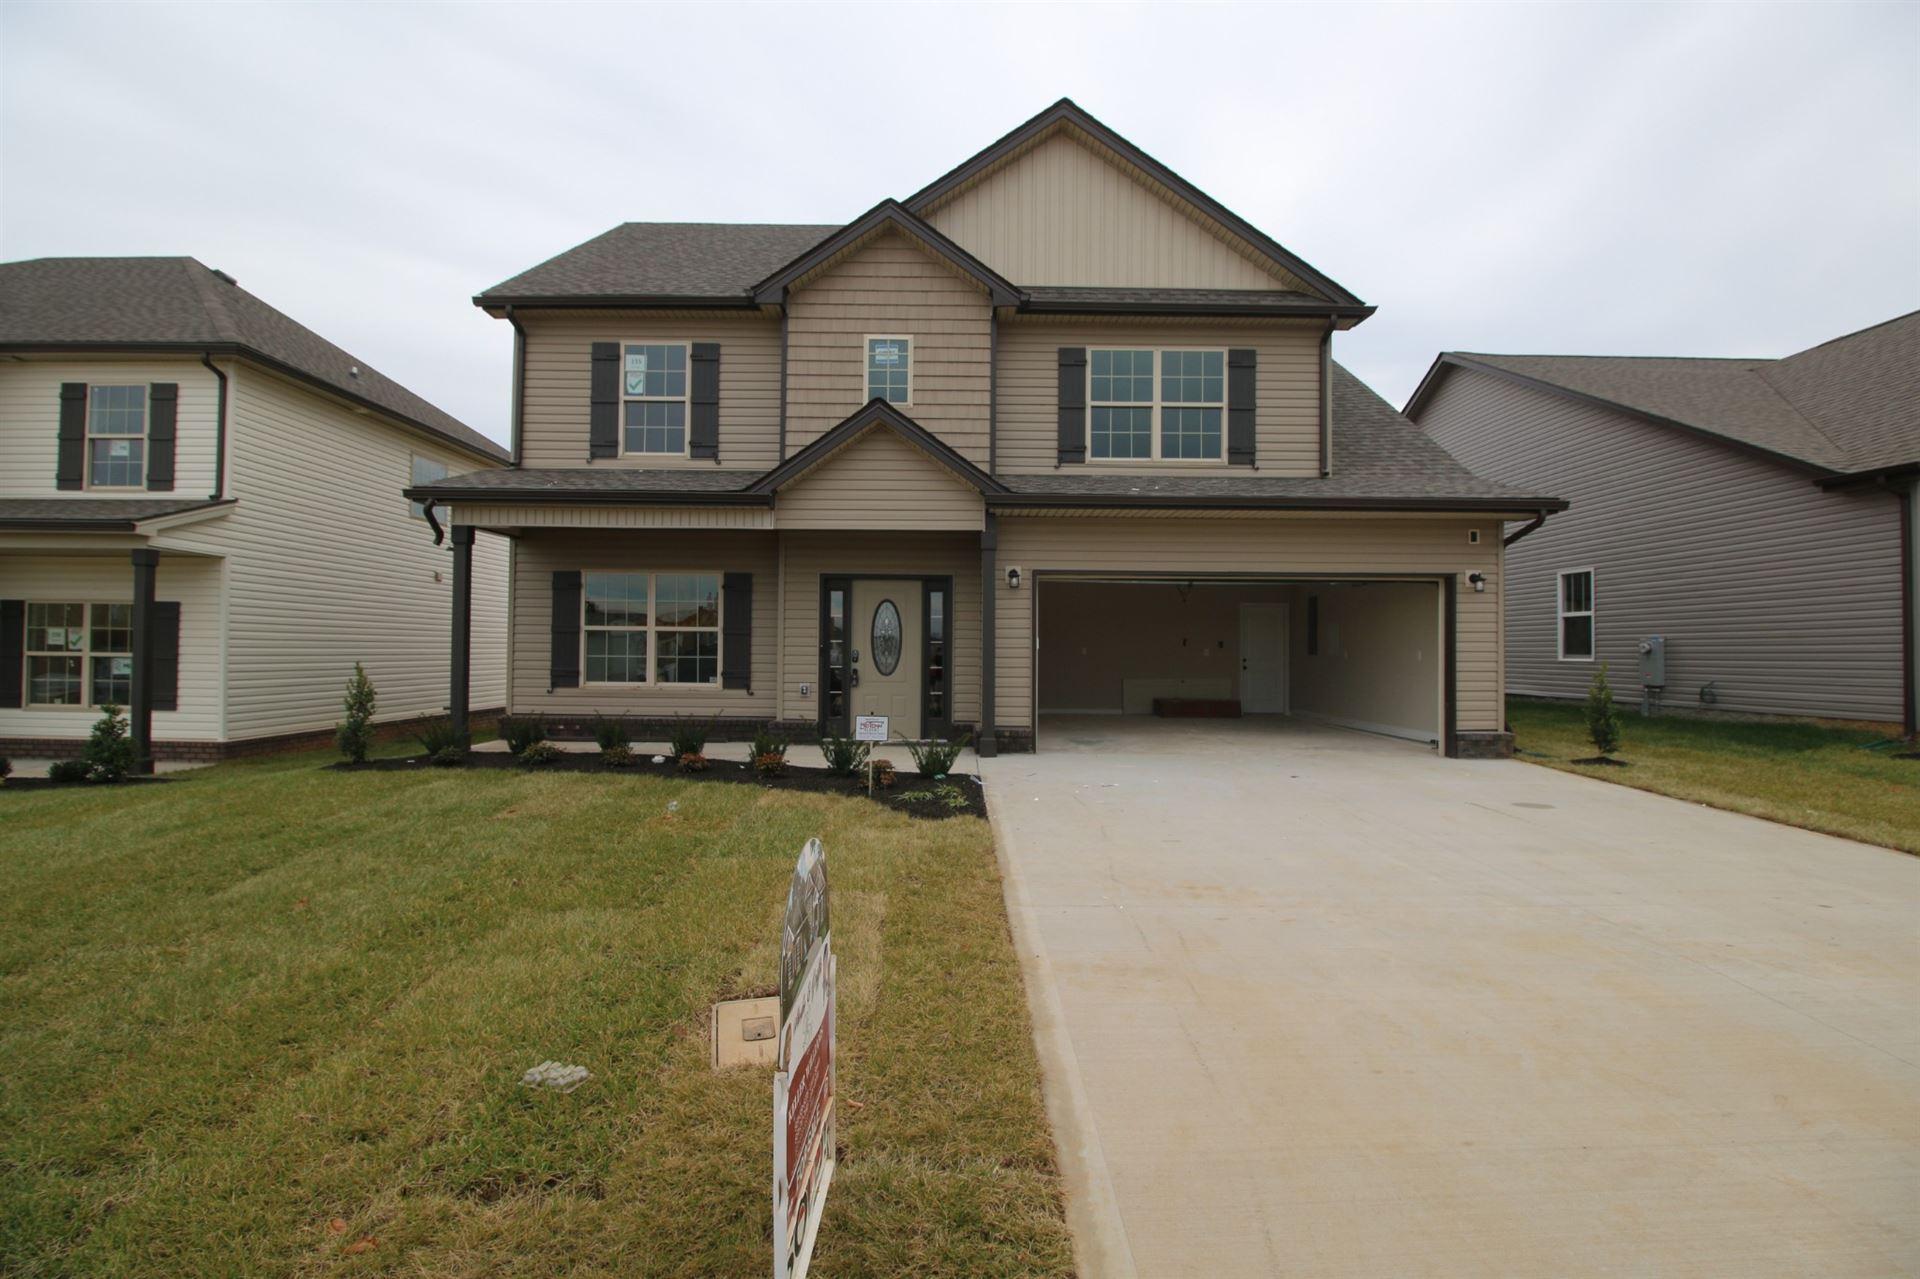 155 Mills Creek, Clarksville, TN 37042 - MLS#: 2289411